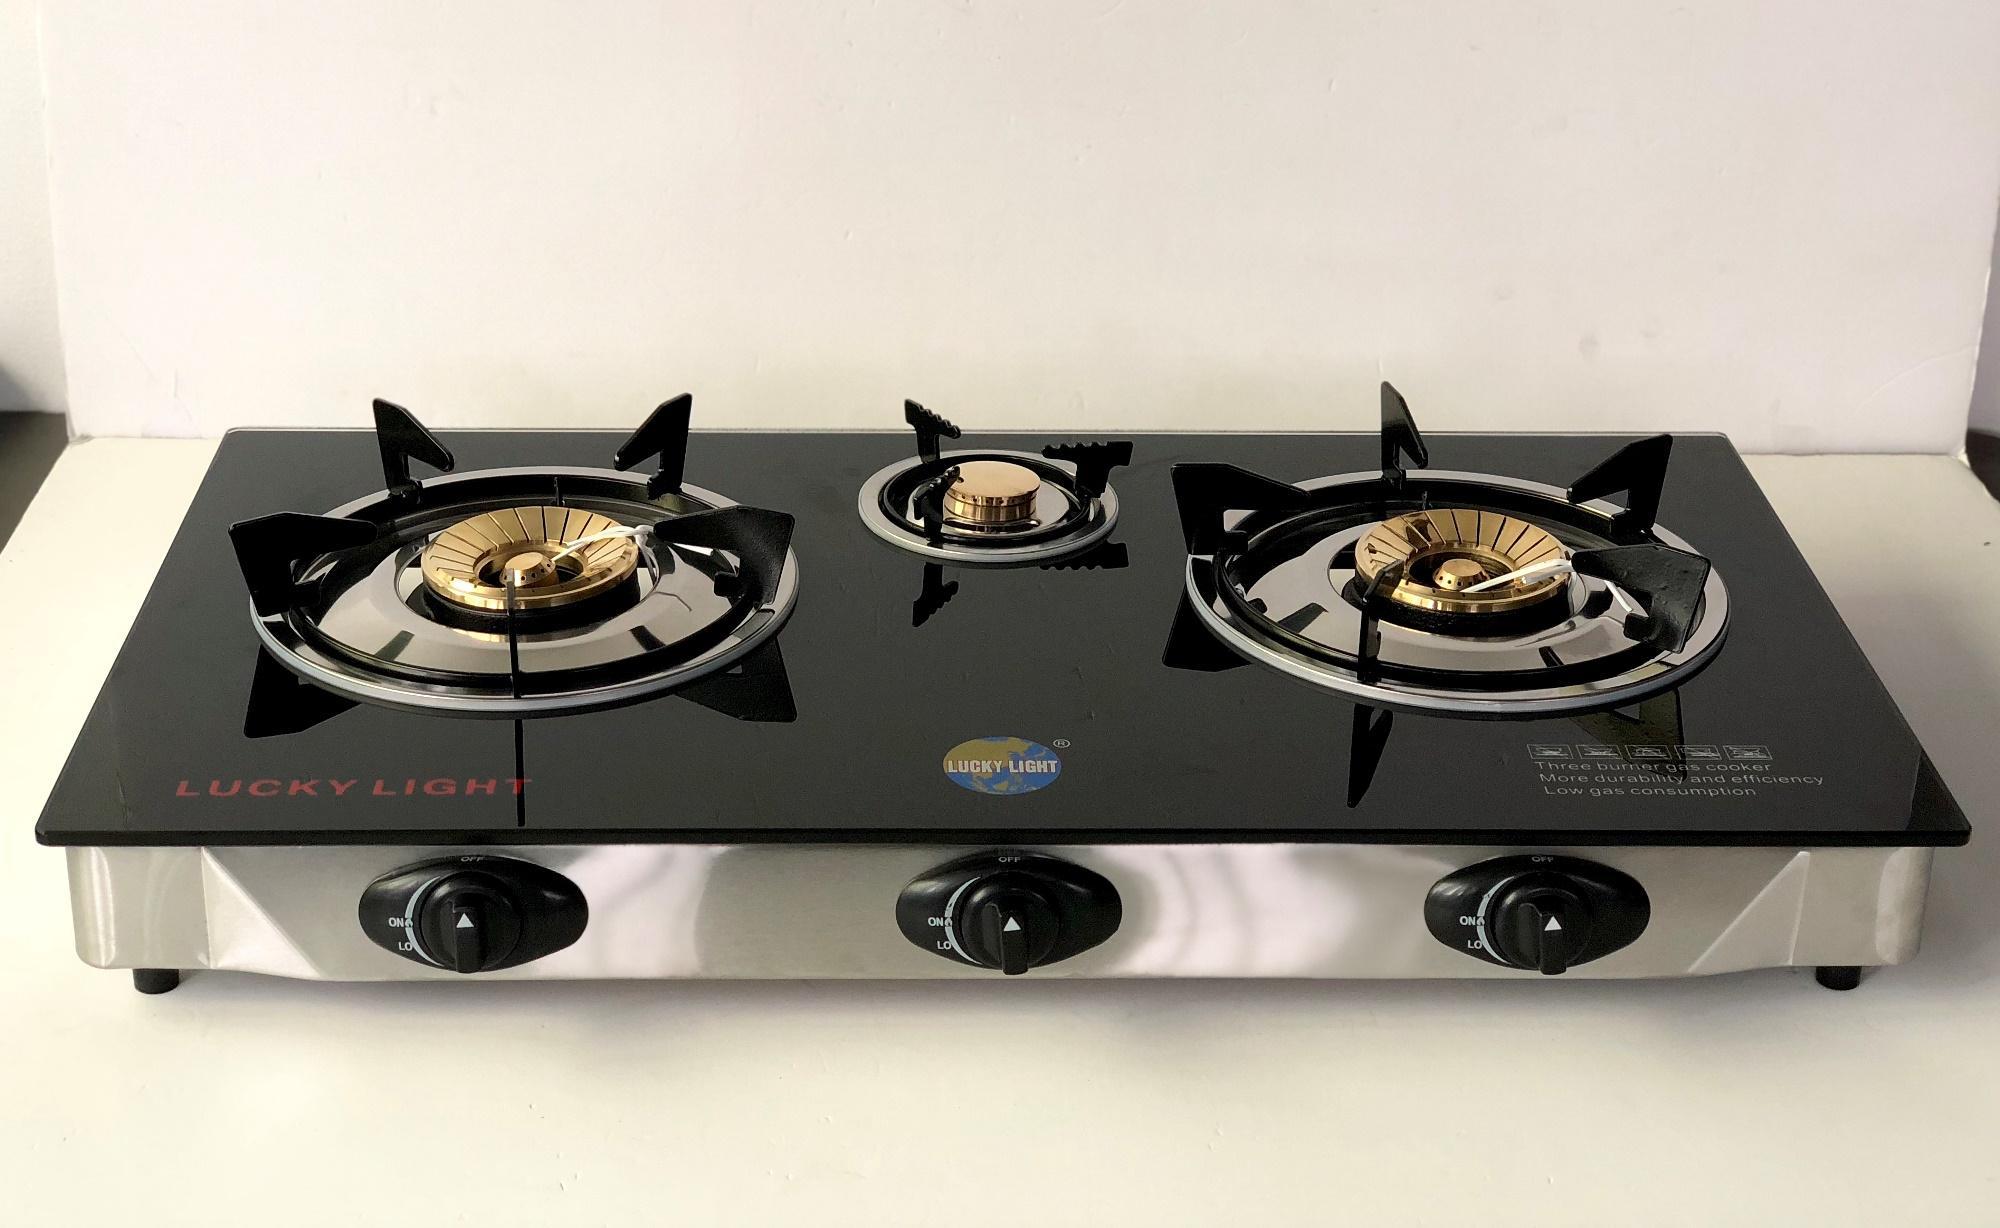 Kitchen Appliances for sale - Cooking Appliances prices, brands ...